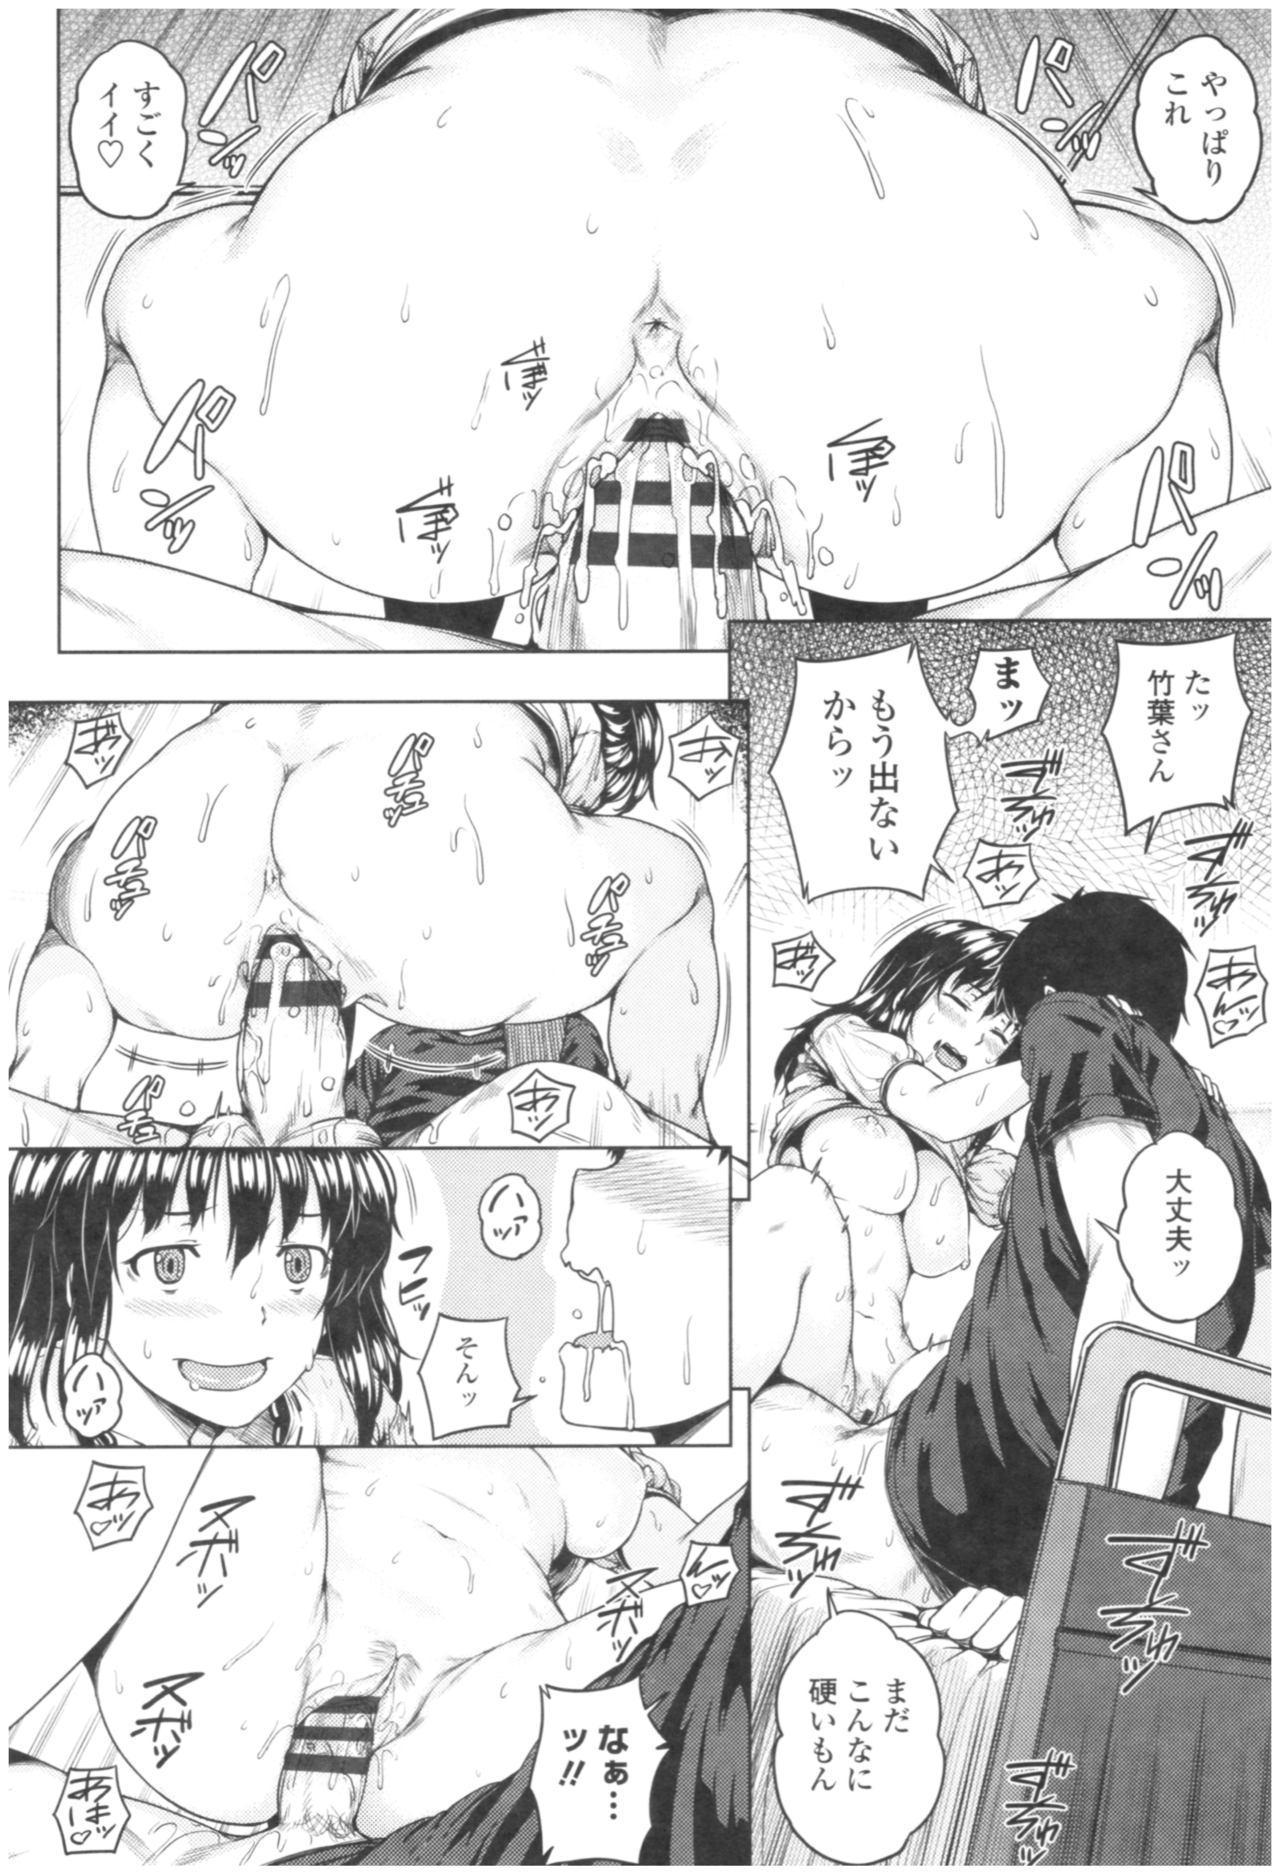 Bitch Kanojo no Hatsukoi Jouji - Her Lewd First Love and SEX 170